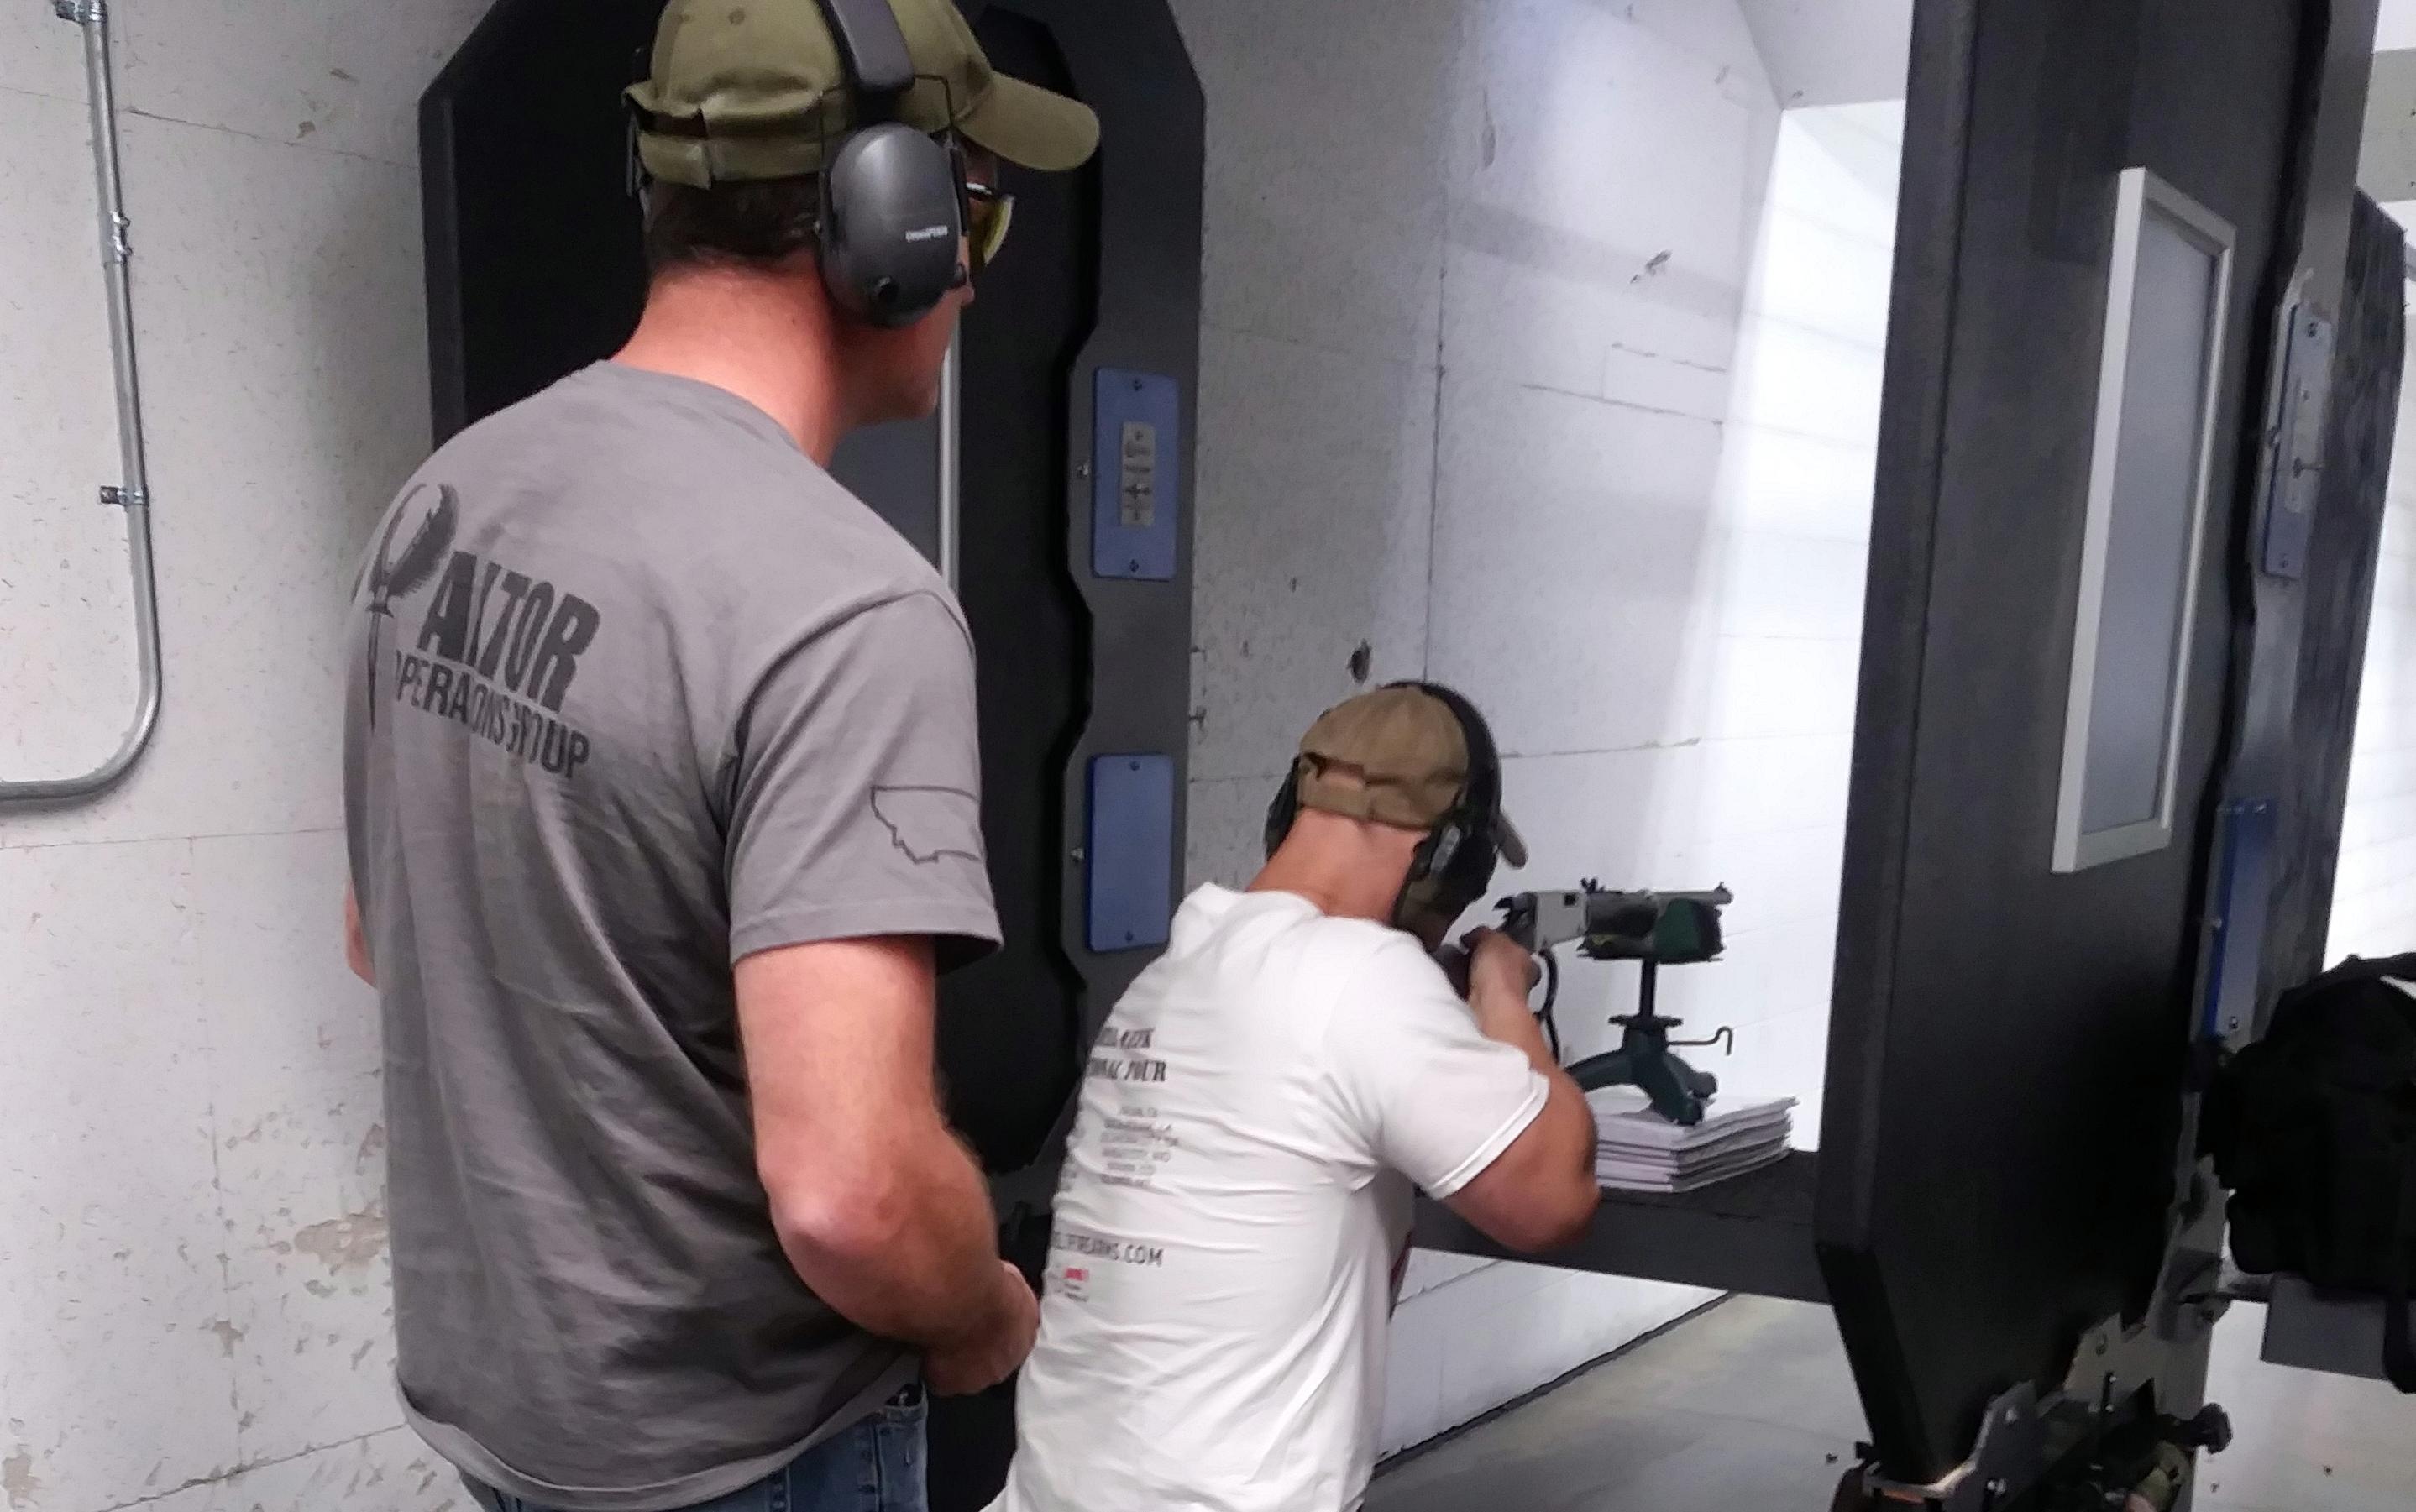 Louisiana Firearms Instructor Classes | Level 1 Firearms Training